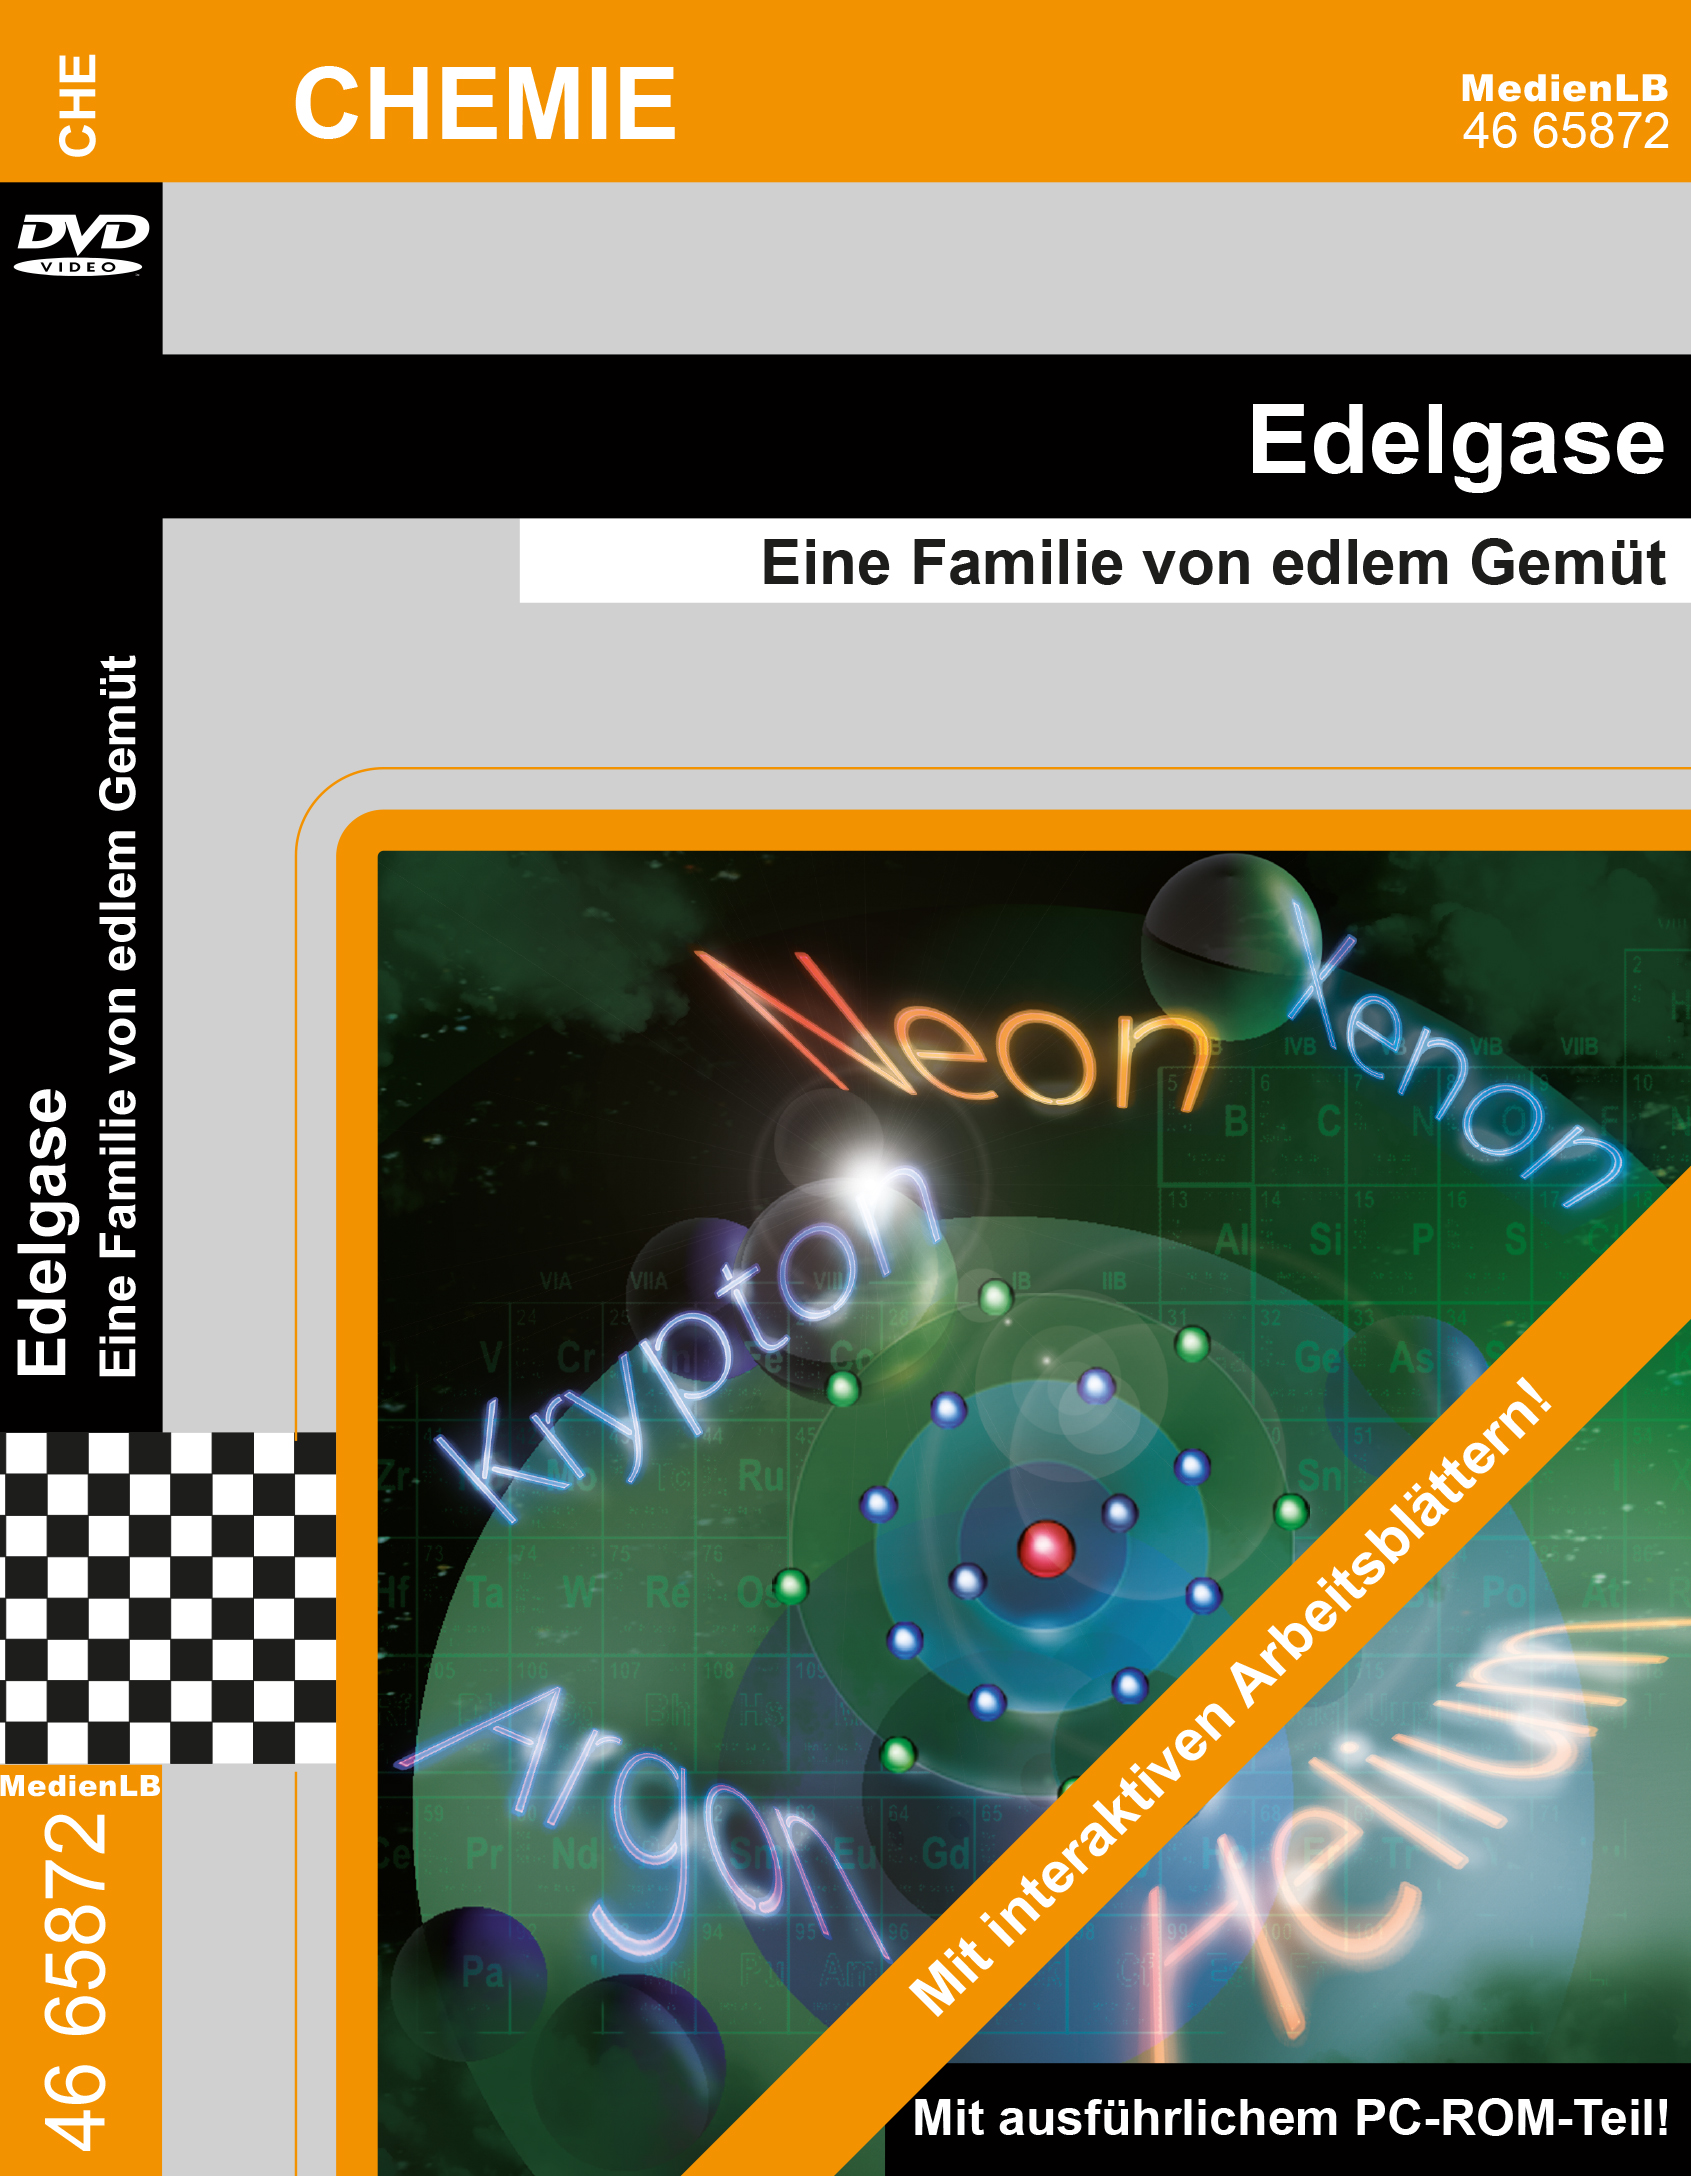 Edelgase - DVD - MedienLB